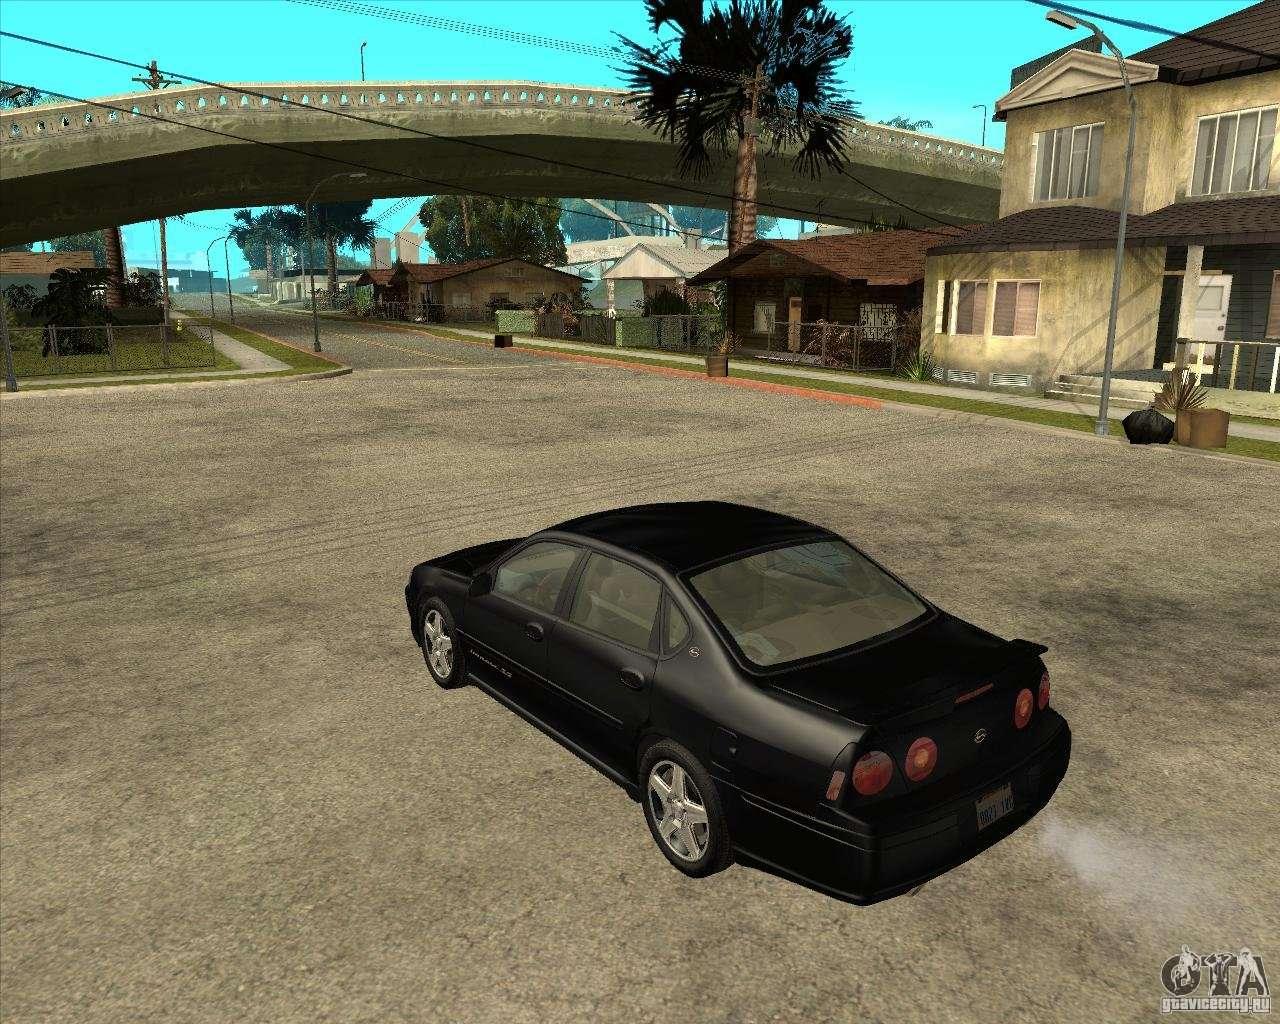 2003 Impala Walk Around